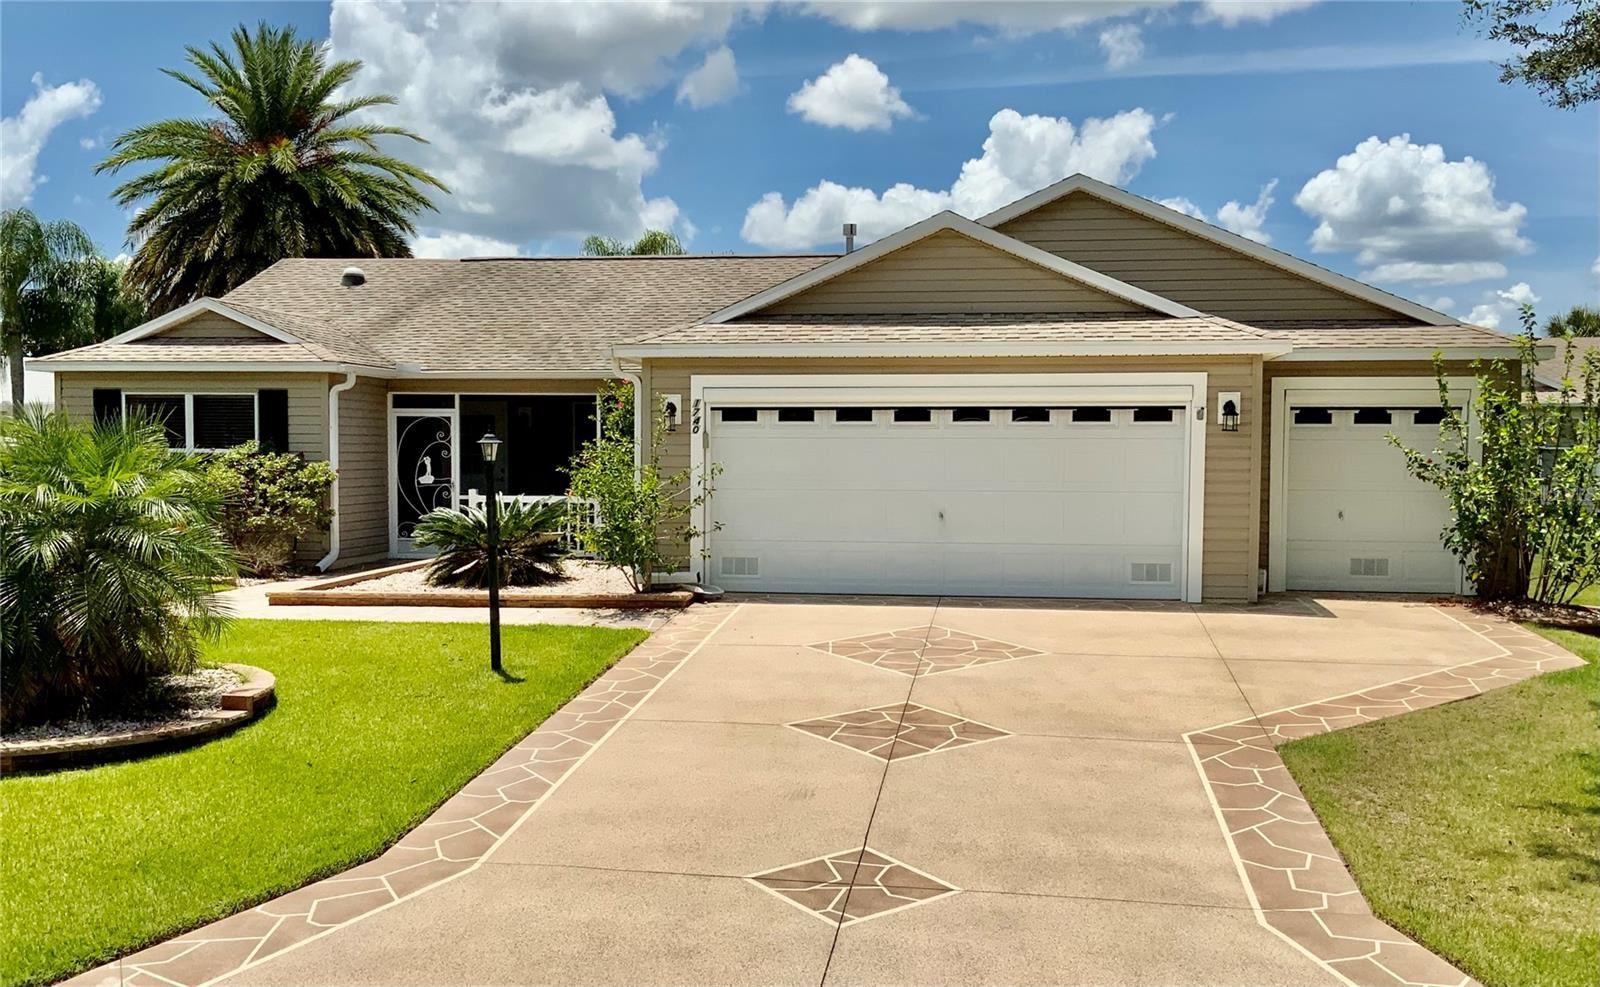 1740 MOUNTVILLE COURT, The Villages, FL 32162 - #: G5044725